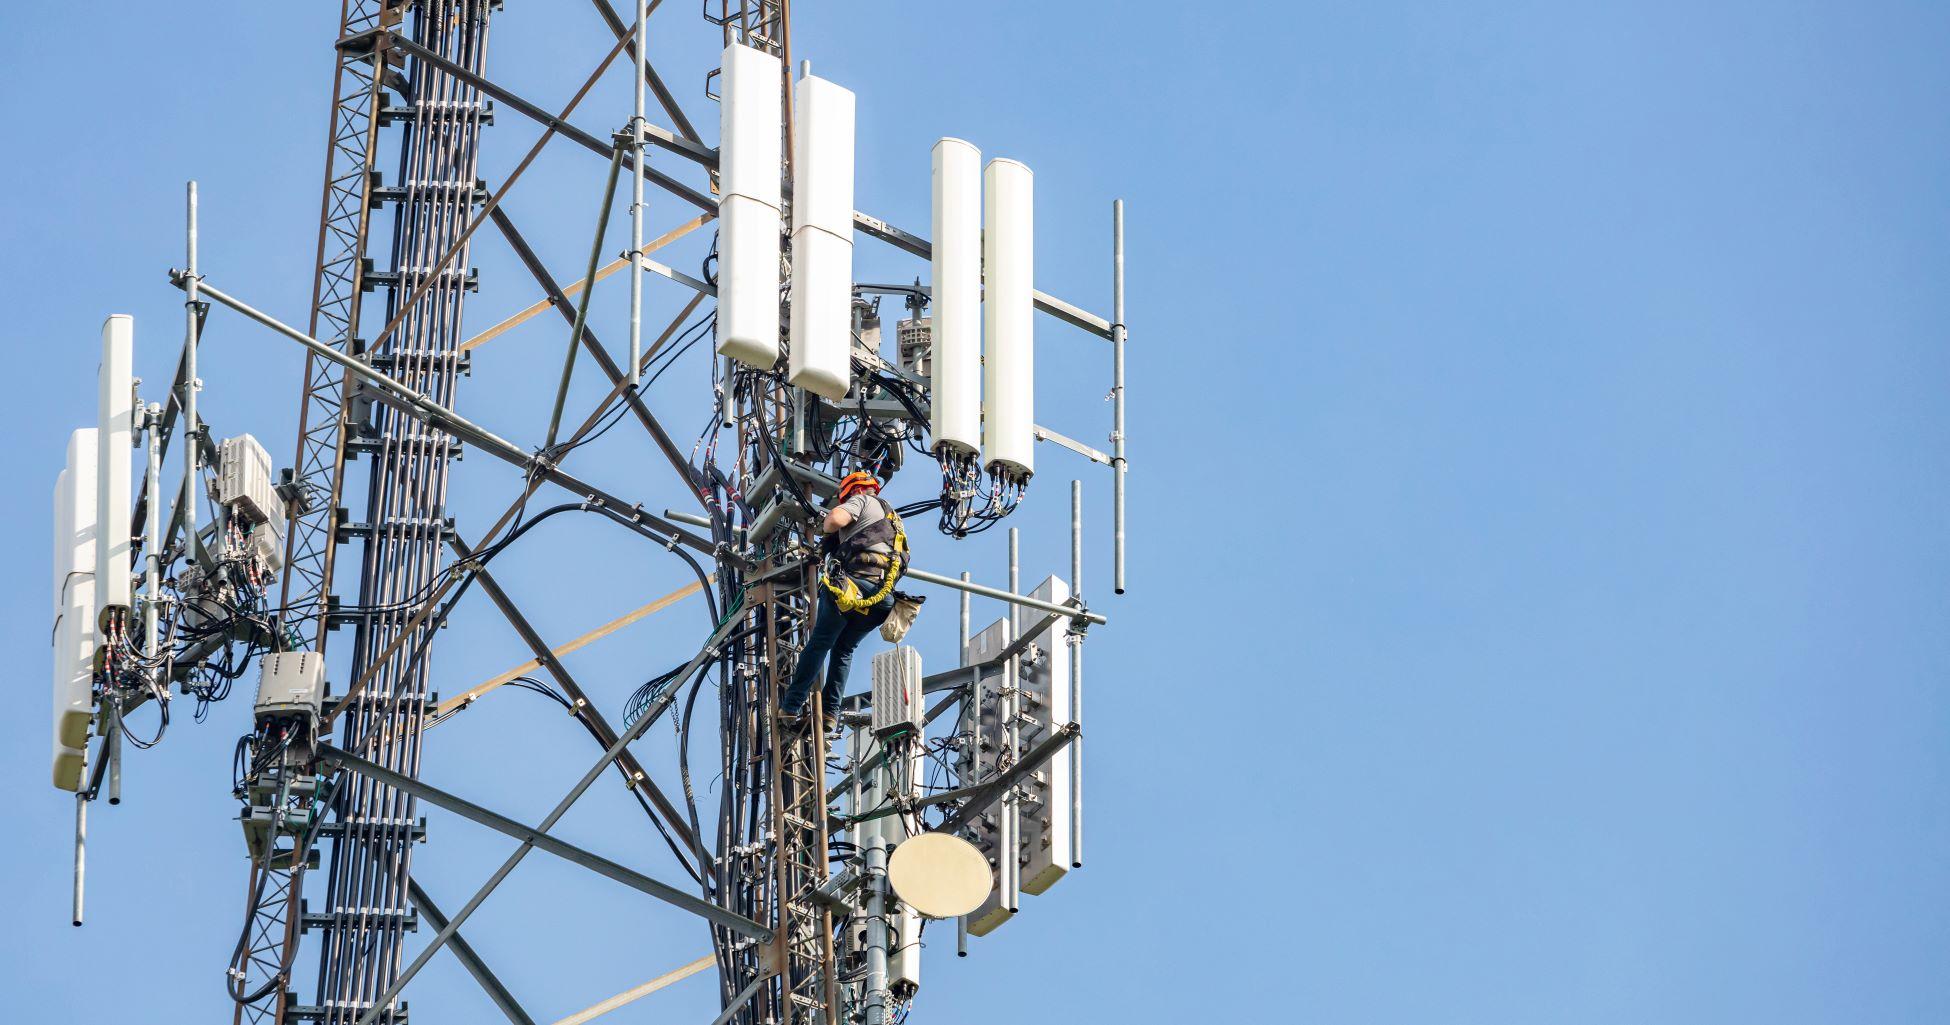 How Do I Train My Telecom Workers?